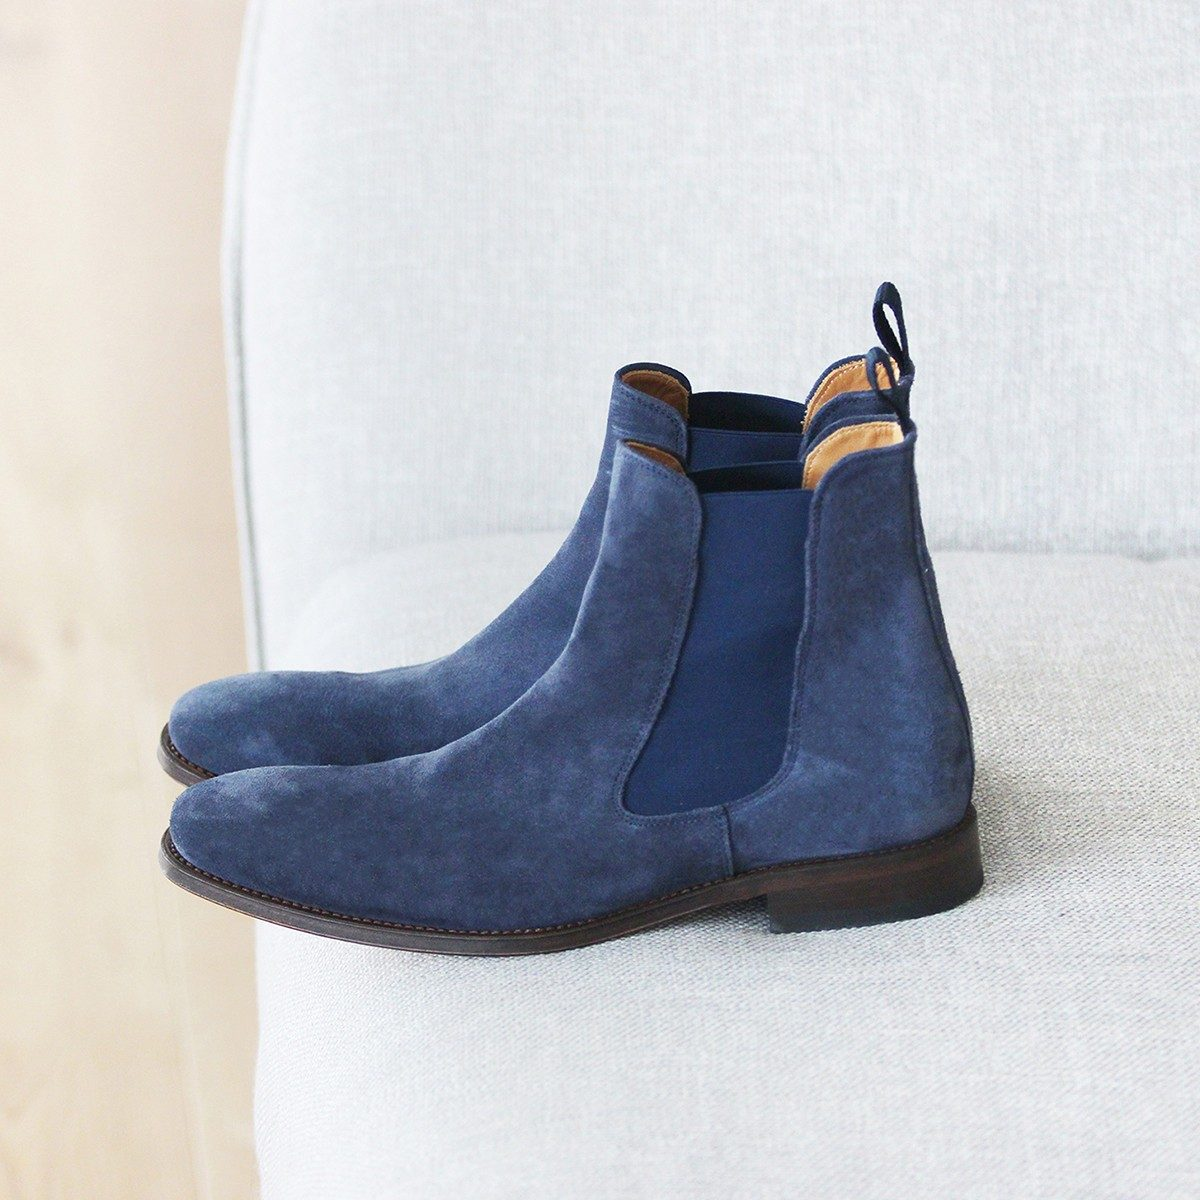 JULES & JENN - chelsea - boots - cuir - bleu